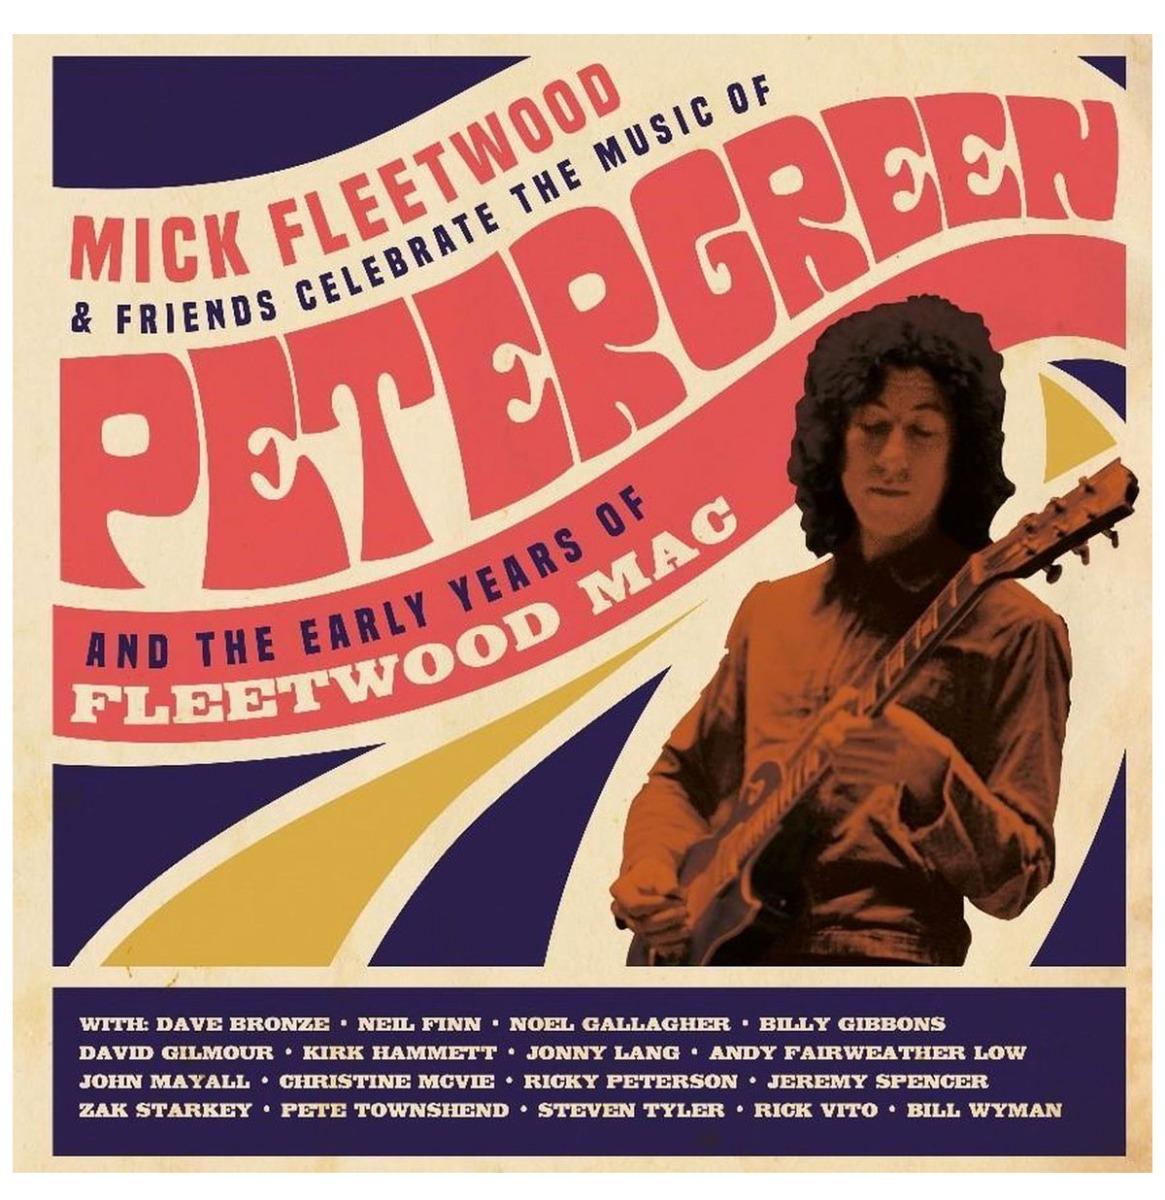 Mick Fleetwood & Friends Celebrate the music of Peter Green Vinyl Box